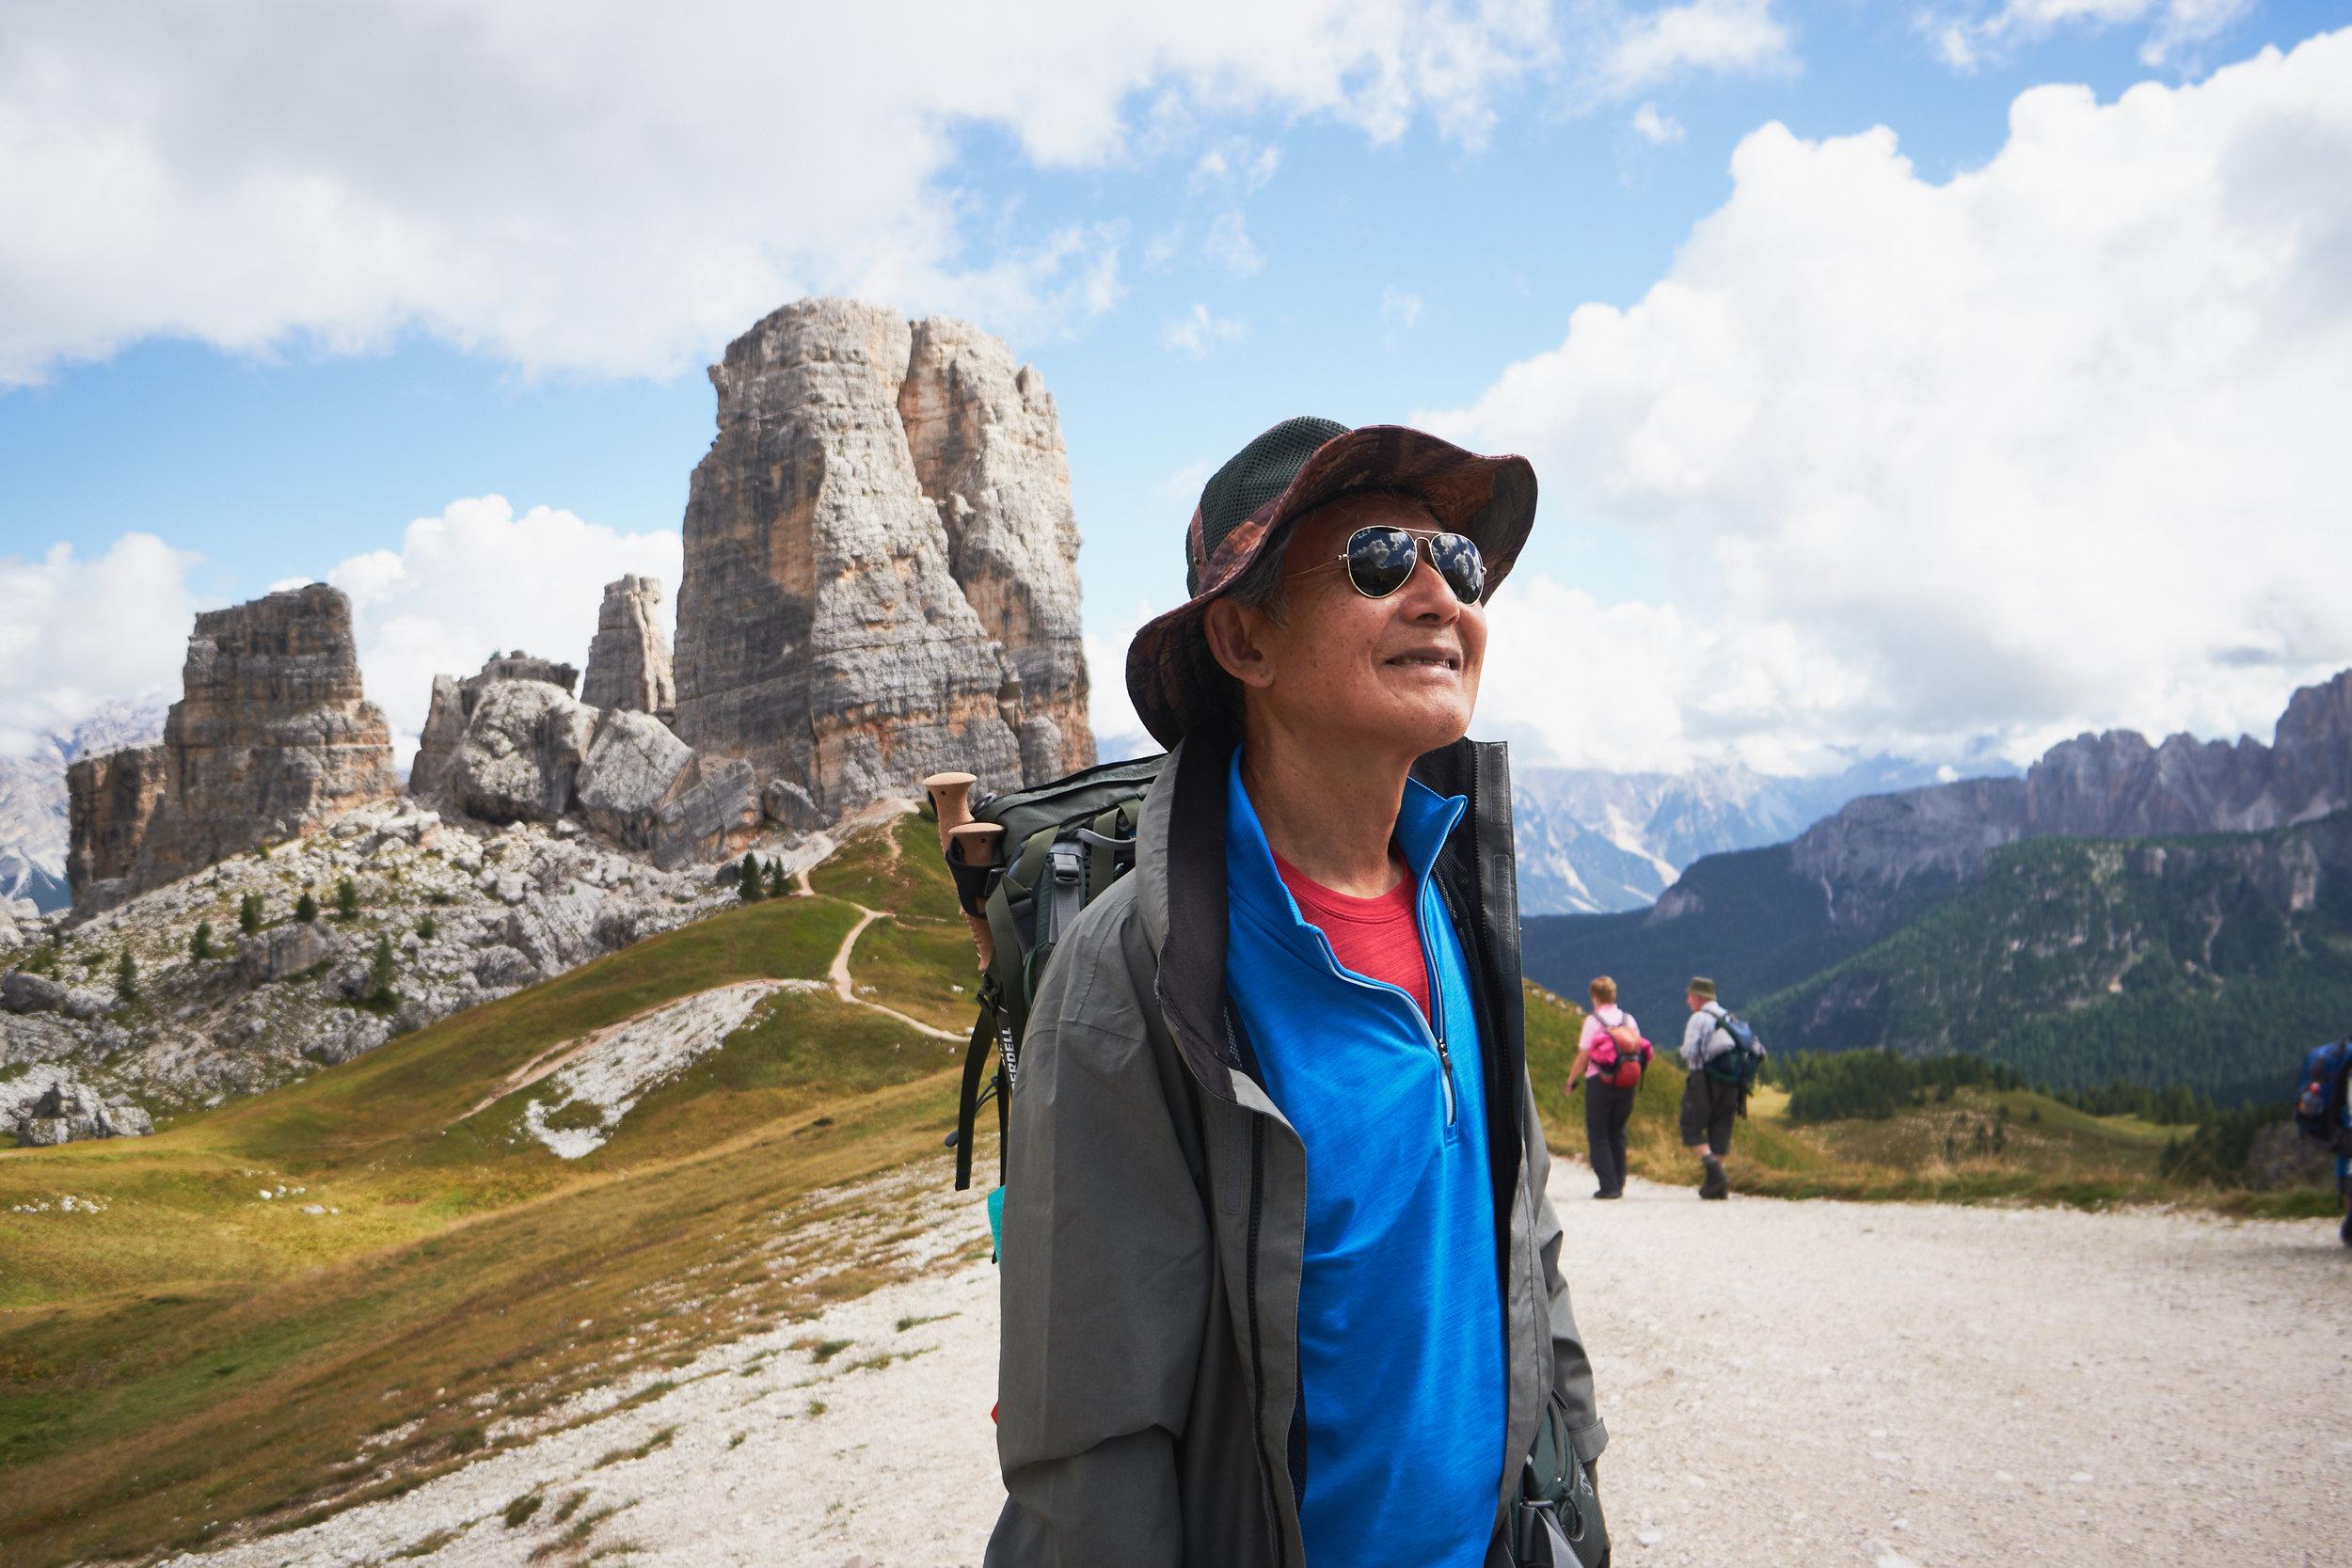 201809_Dolomites-284_web.jpg